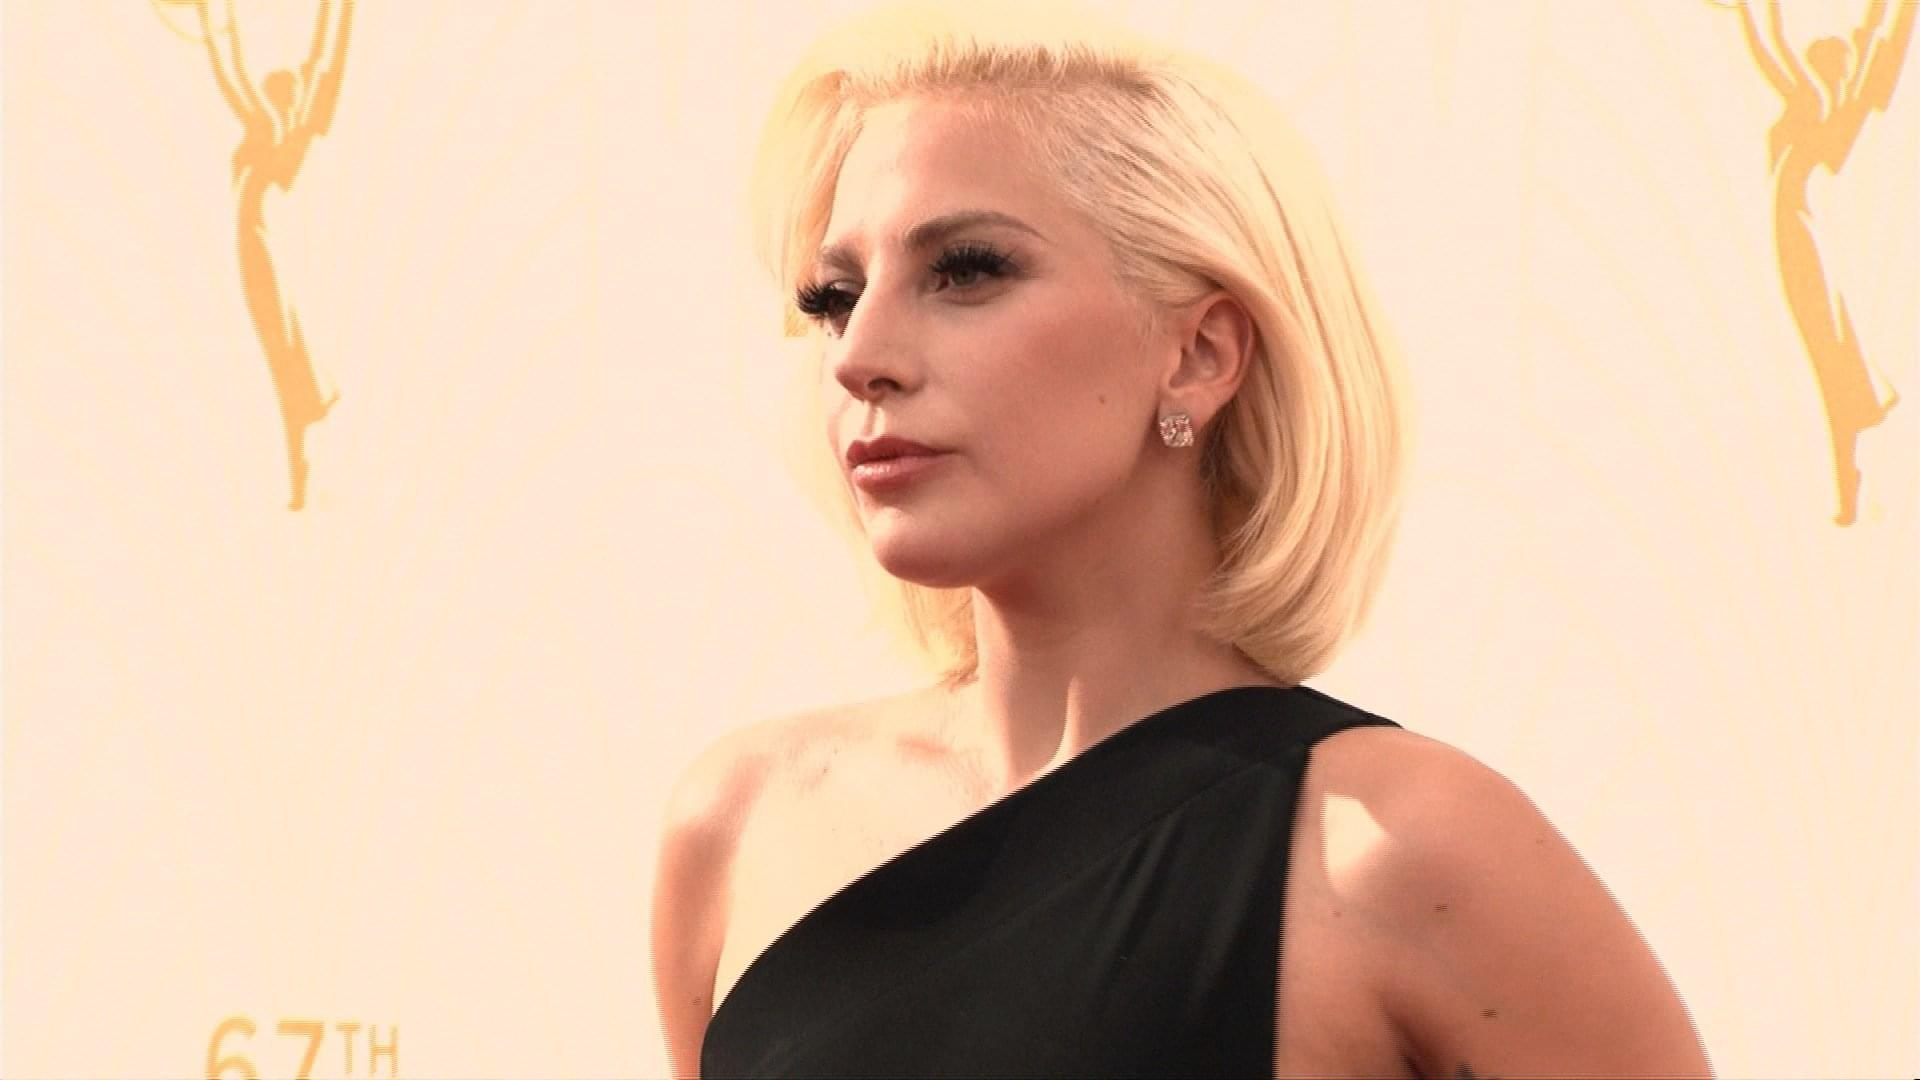 Lady Gaga Cryptic Instagram Photo's